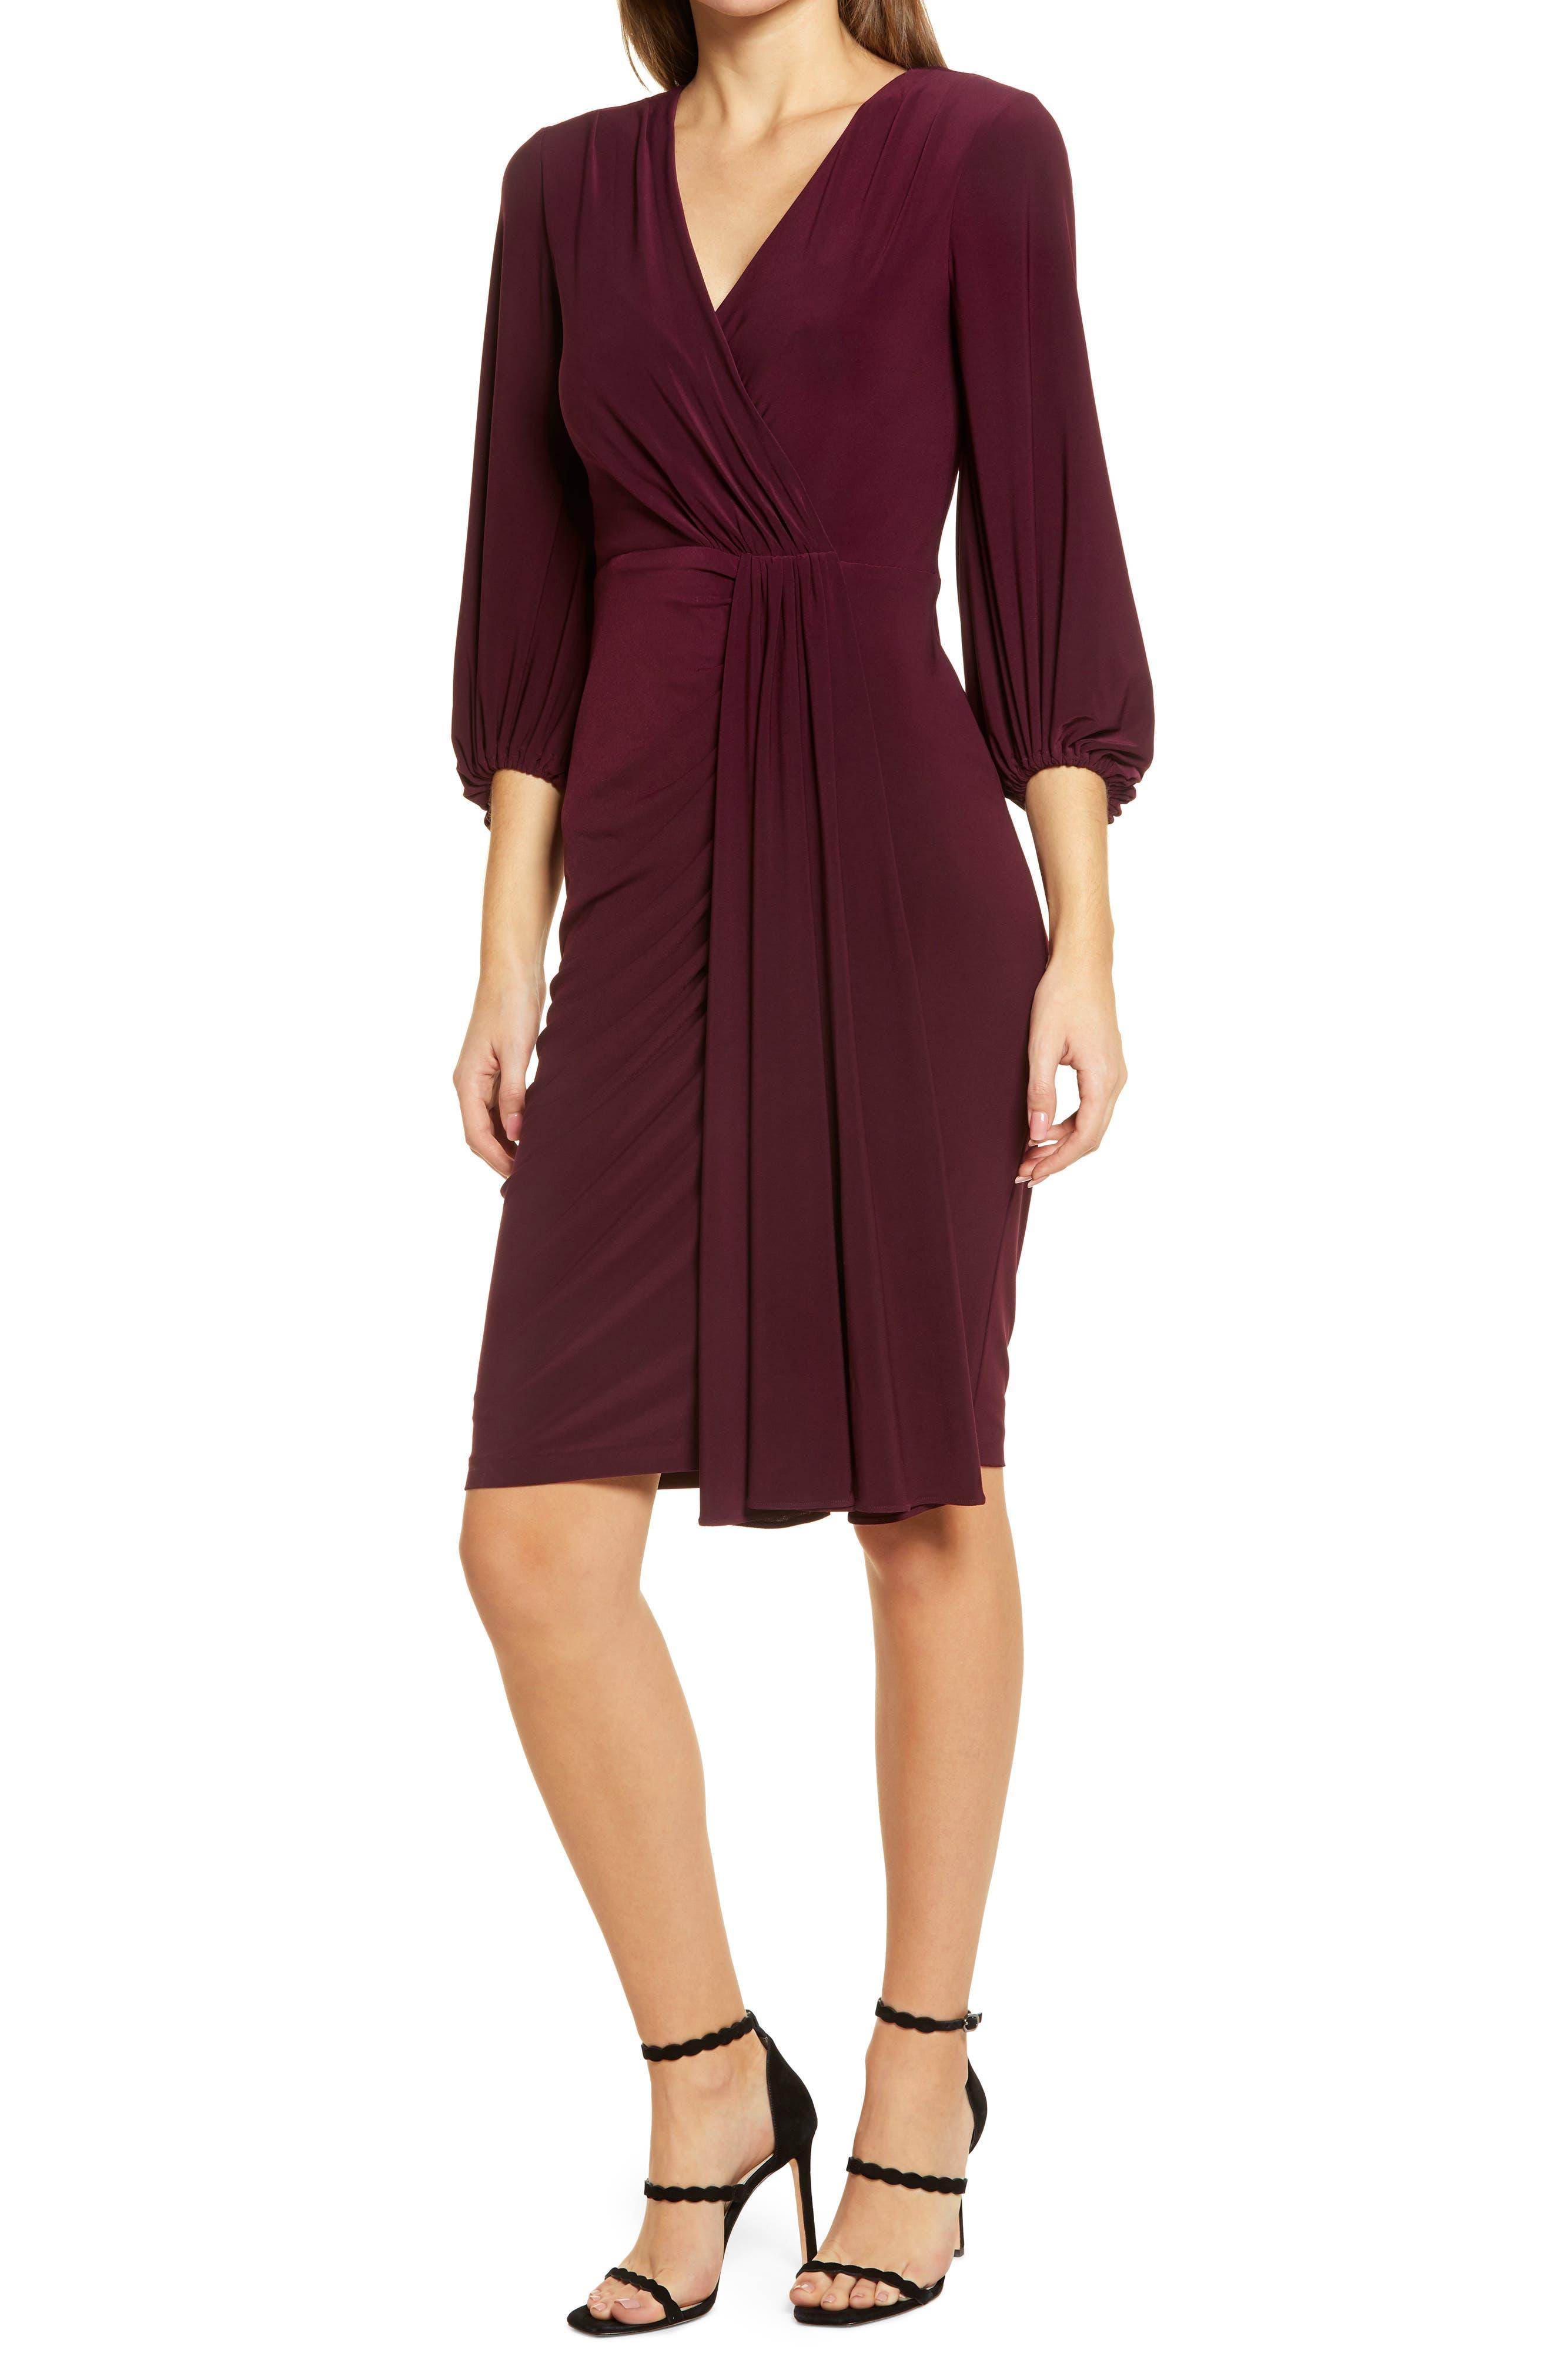 Wrap Look Long Sleeve Dress